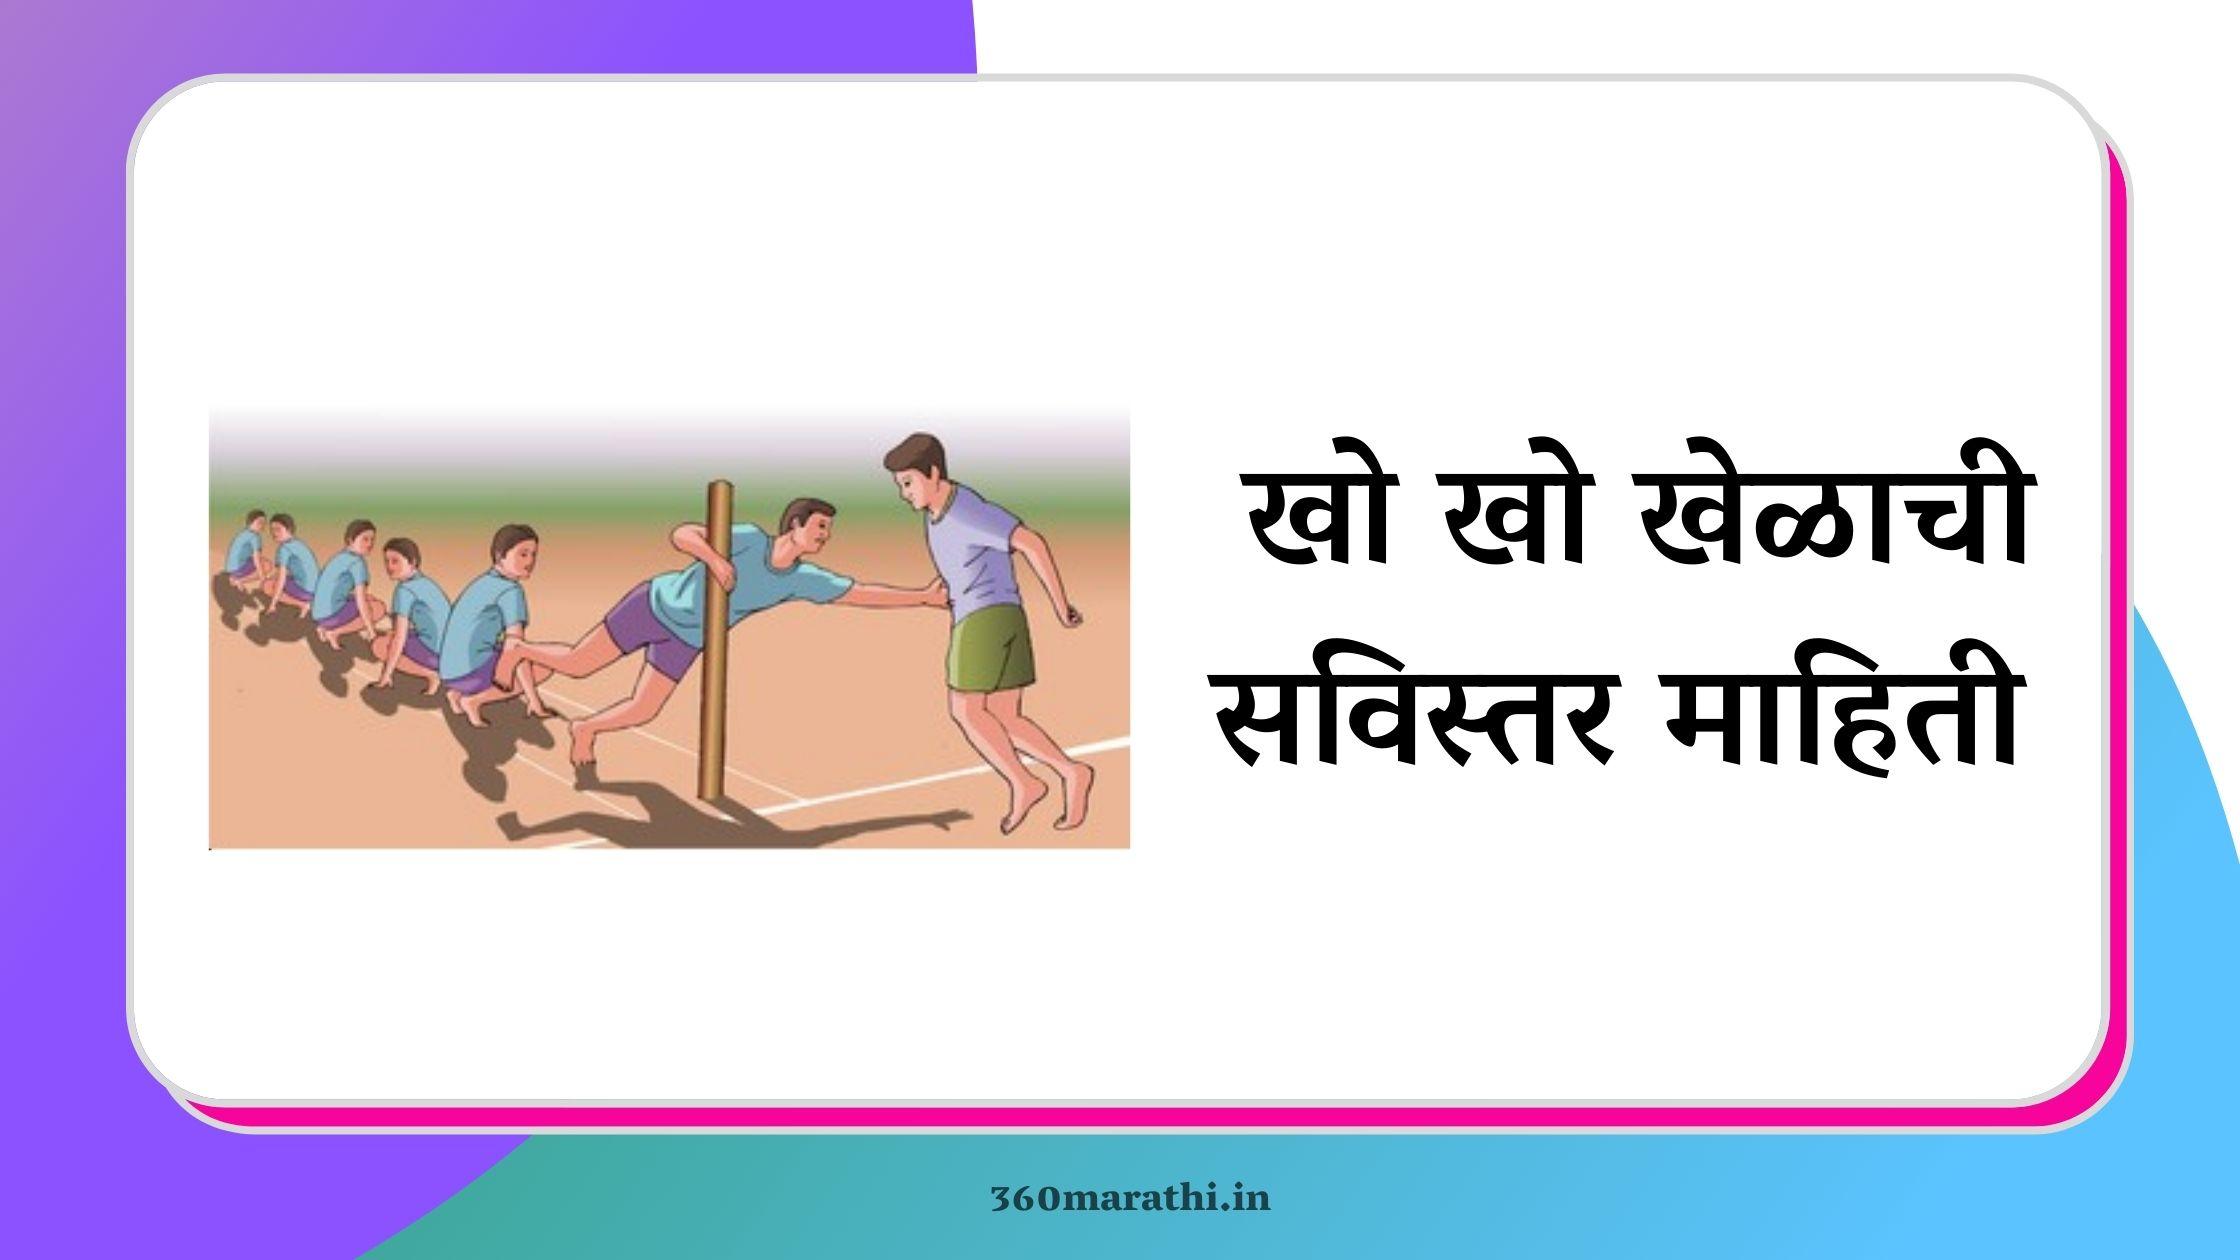 खो खो खेळाची माहिती | Kho Kho information in marathi